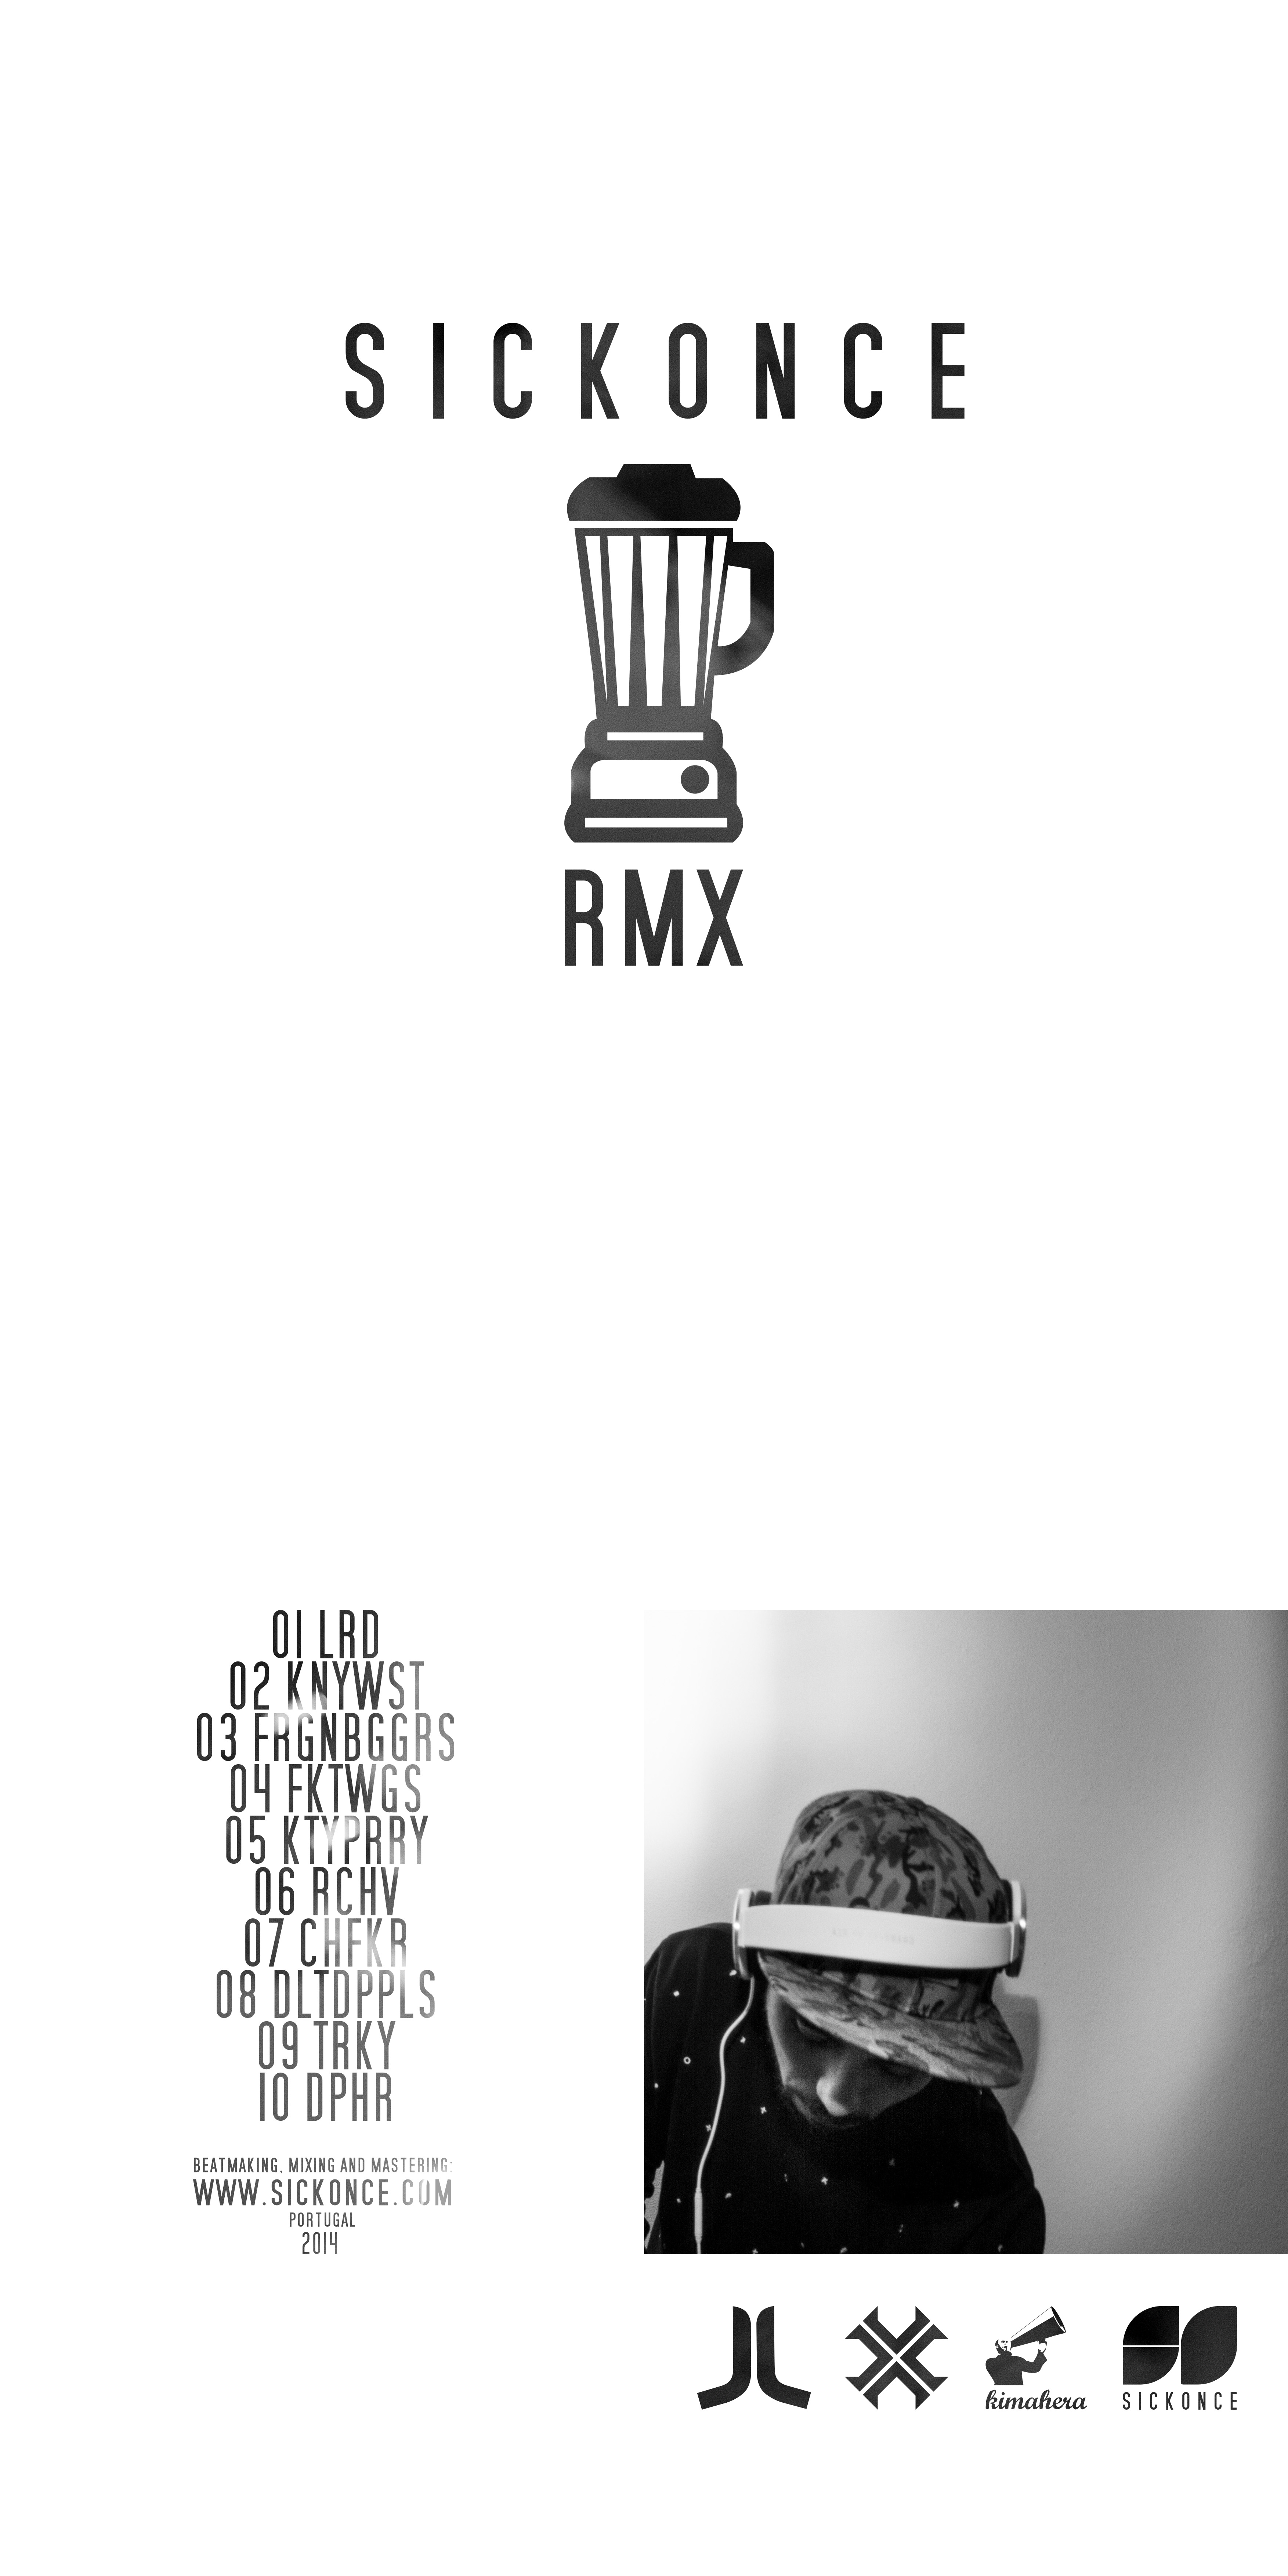 Sickonce - RMX